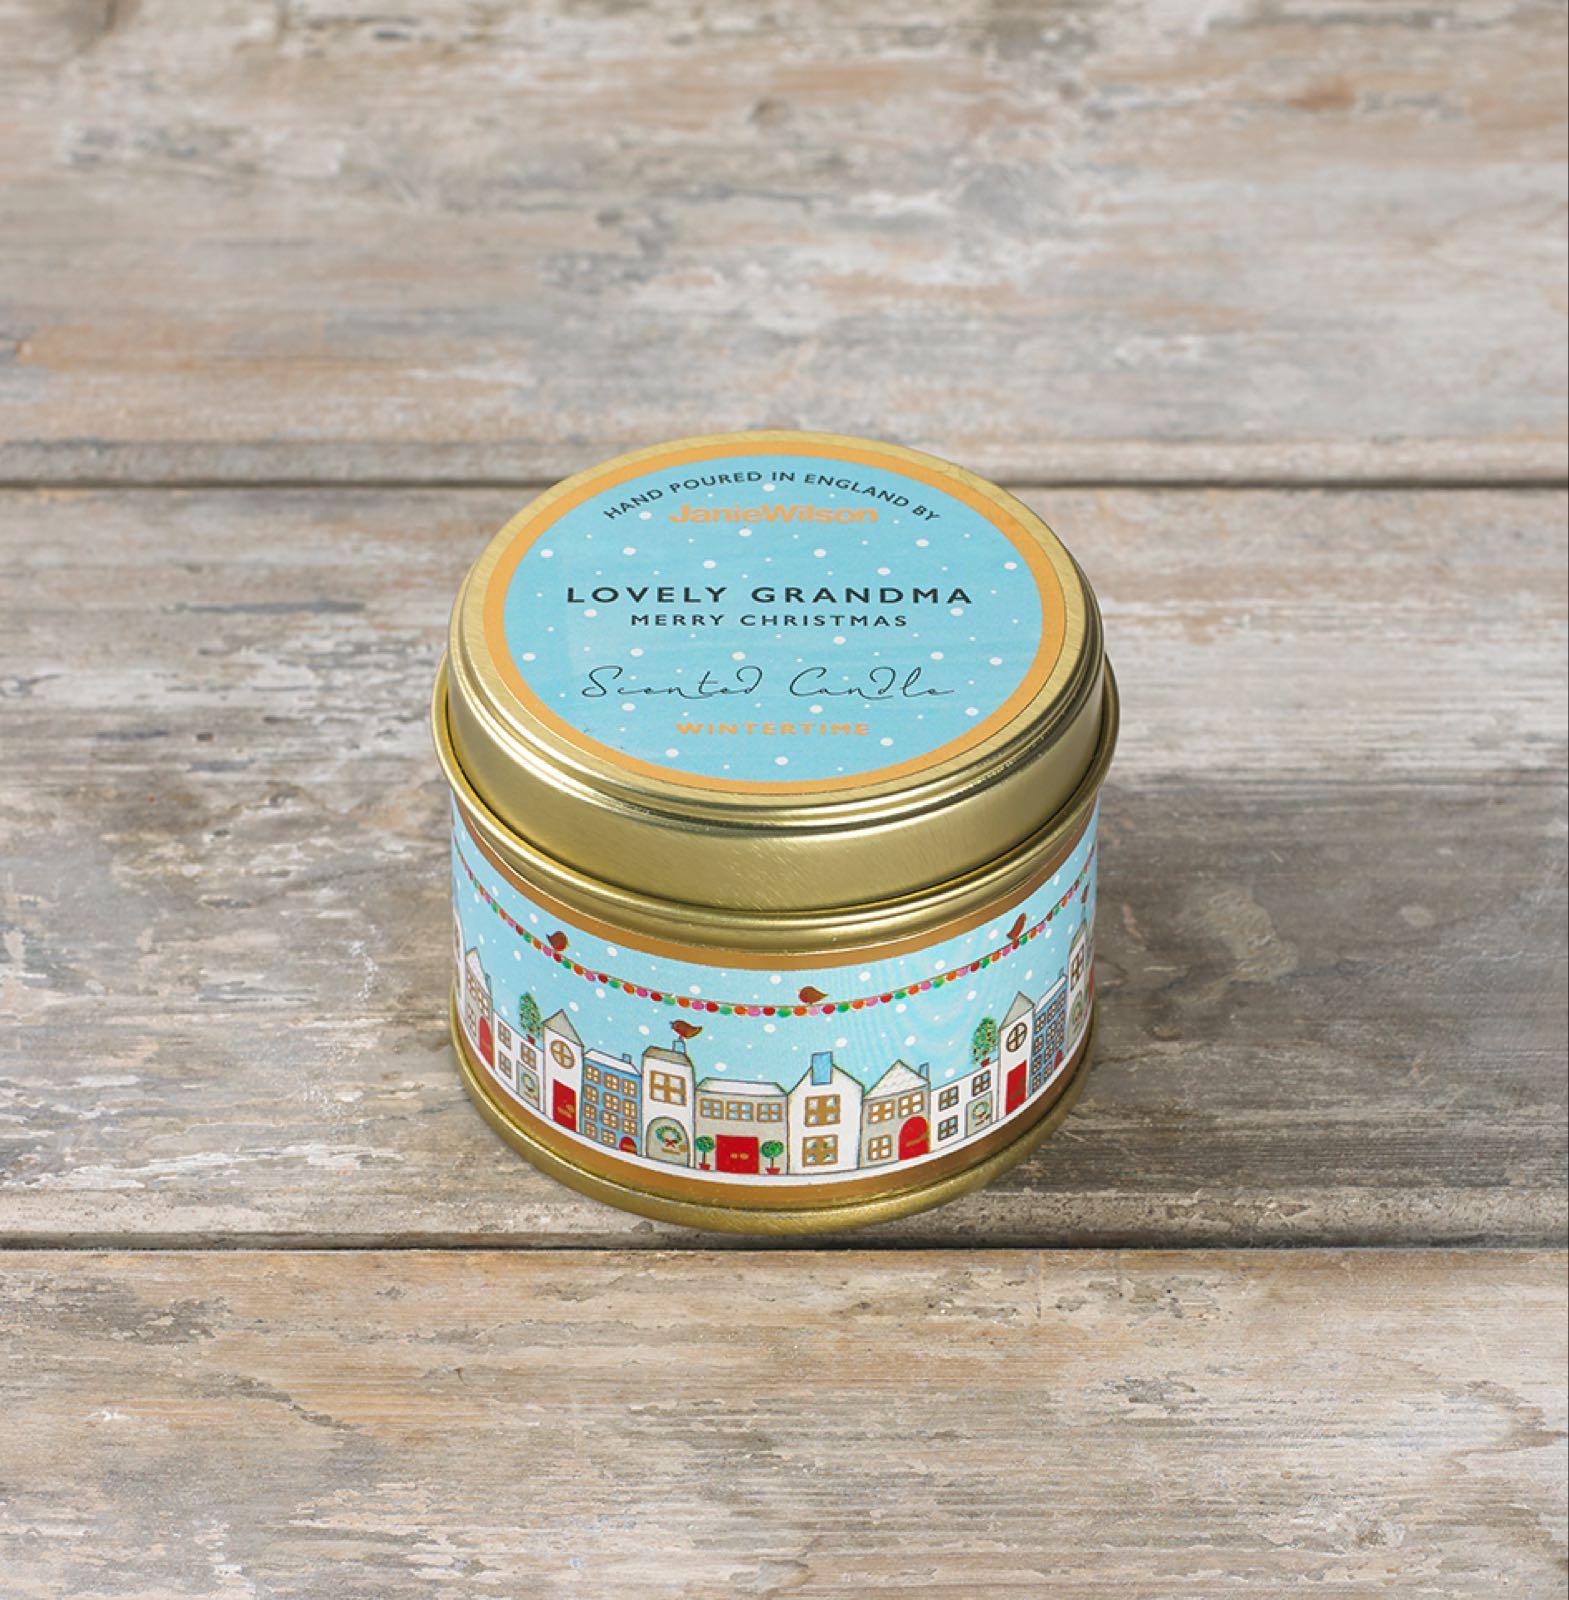 Janie wilson lovely Grandma merry Christmas small fragranced wintertime tinned candle